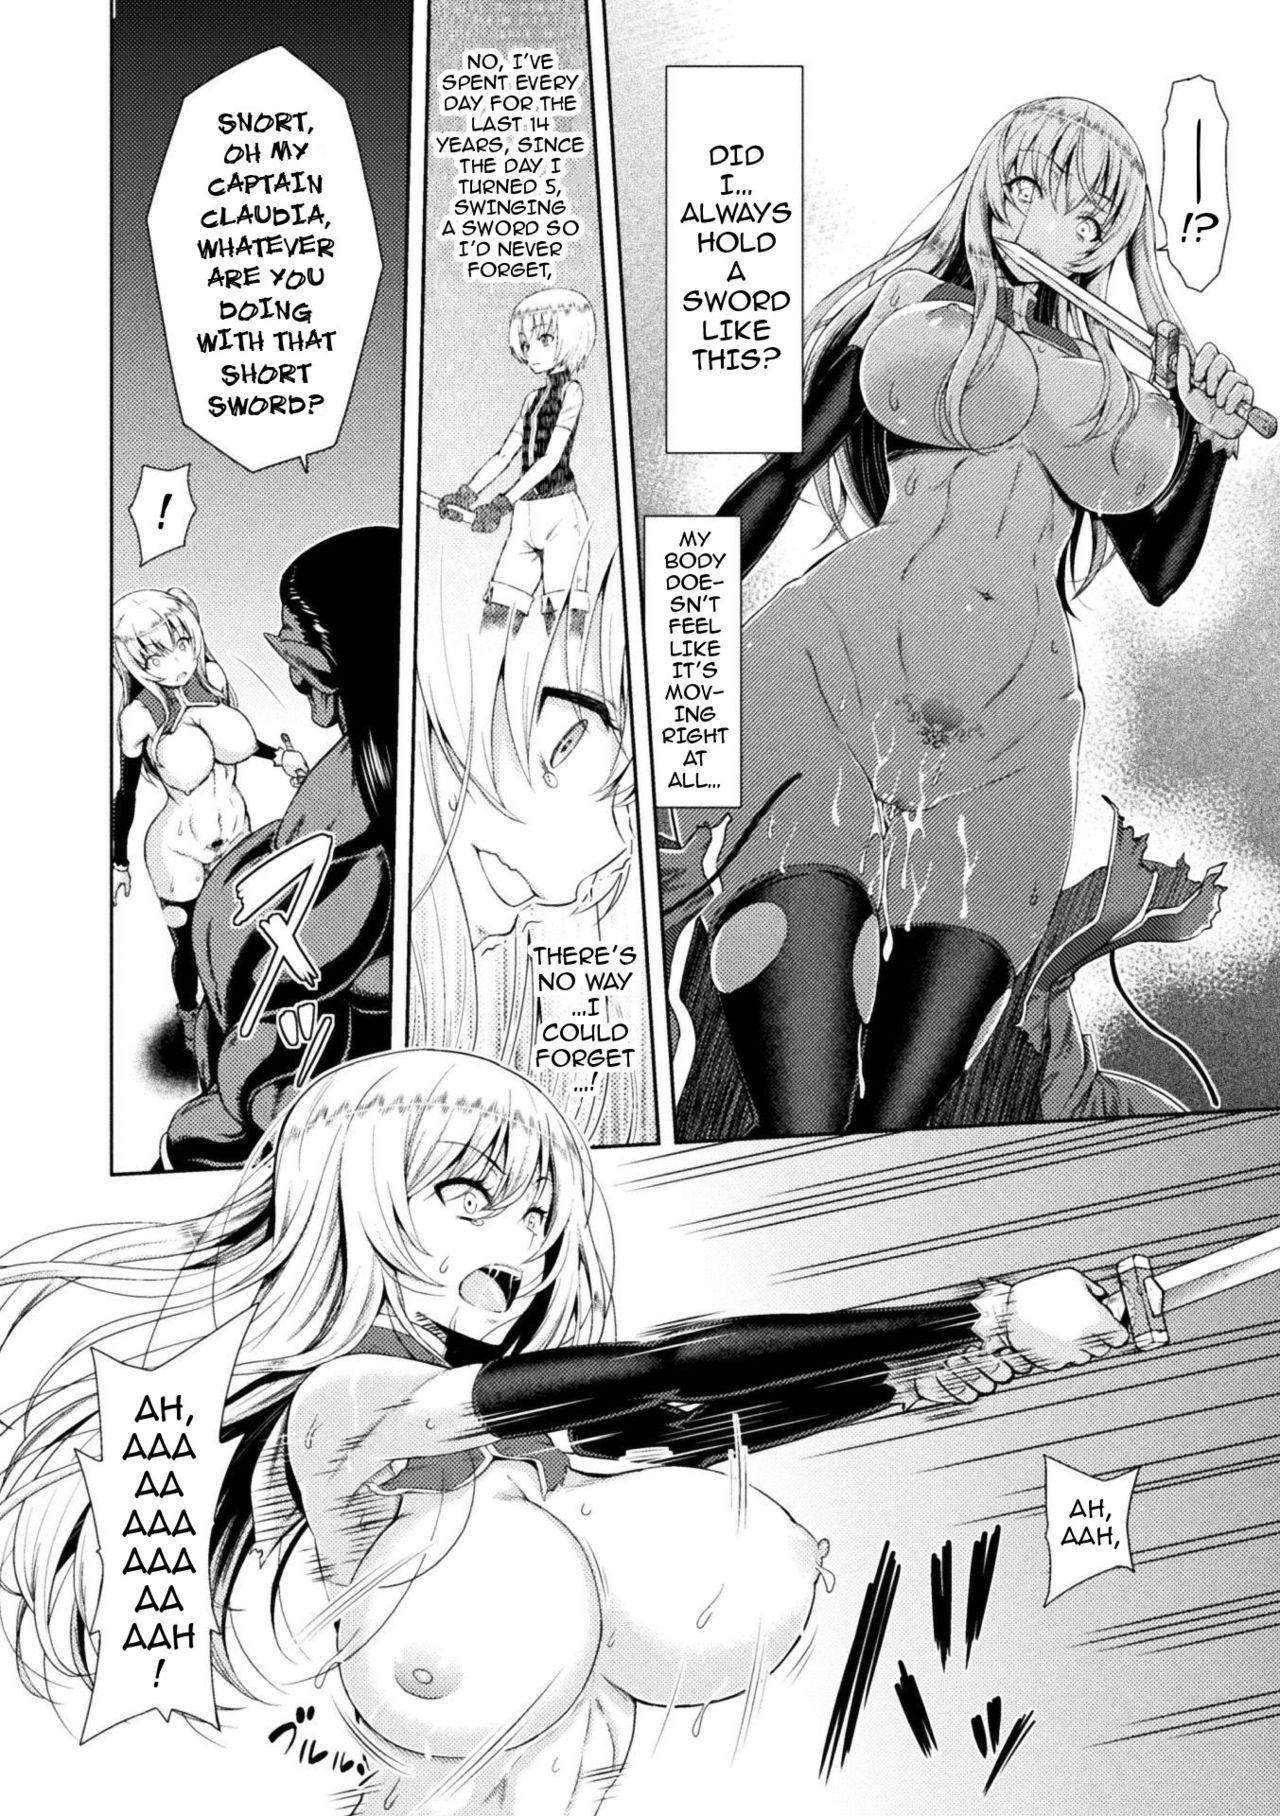 [Yamada Gogogo] Erona ~Orc no Inmon ni Okasareta Onna Kishi no Matsuro~ | Erona ~The Fall of a Beautiful Knight Cursed with the Lewd Mark of an Orc~ Ch. 1-3 [English] {darknight} 43